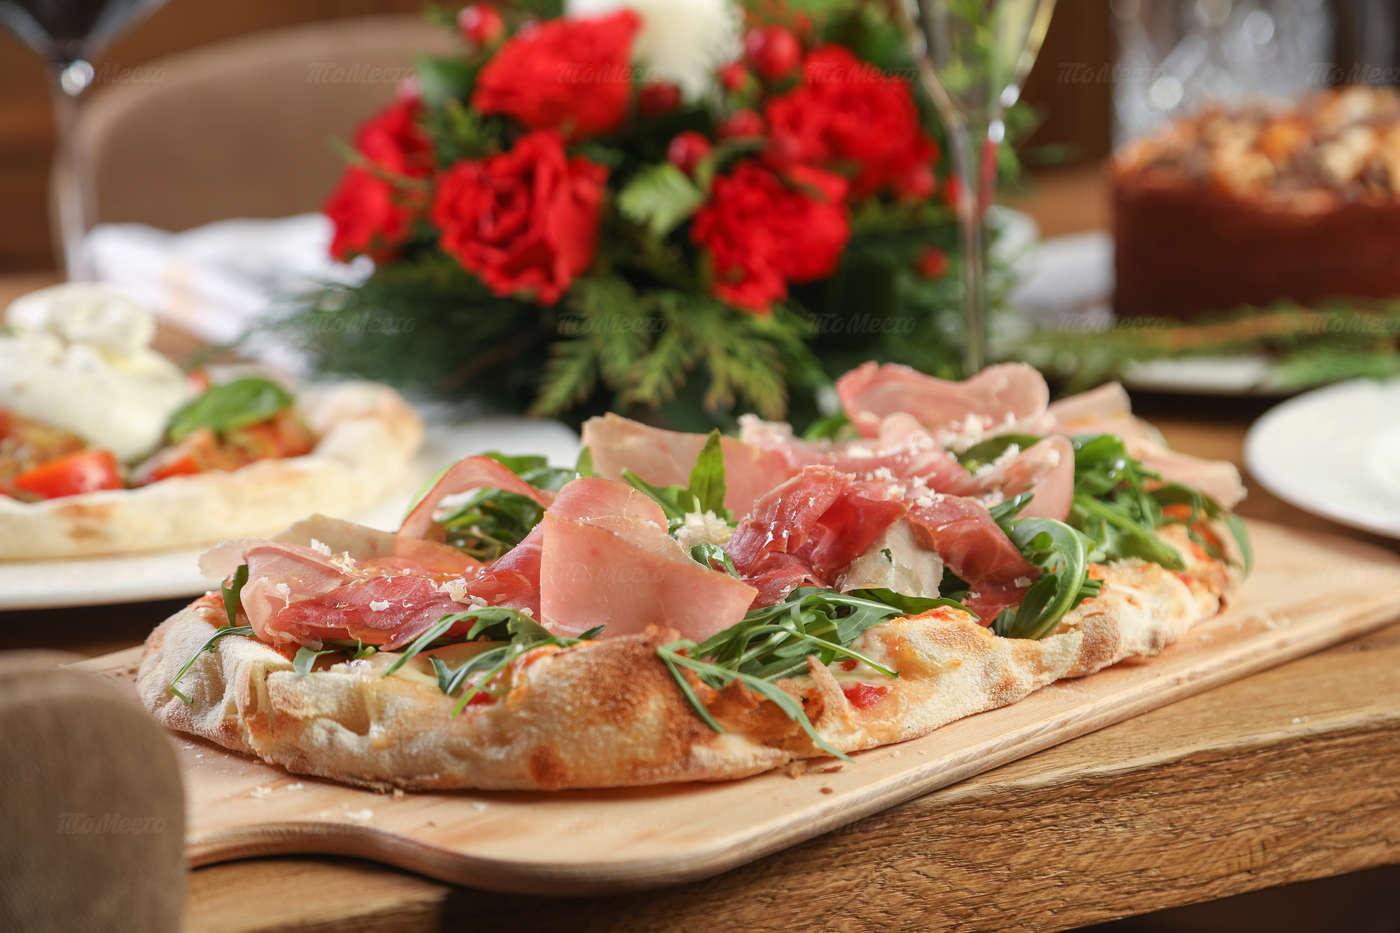 Меню ресторана Pinzeria by Bontempi (Пинцерия Бонтемпи) на Верх-Исетском бульваре фото 66